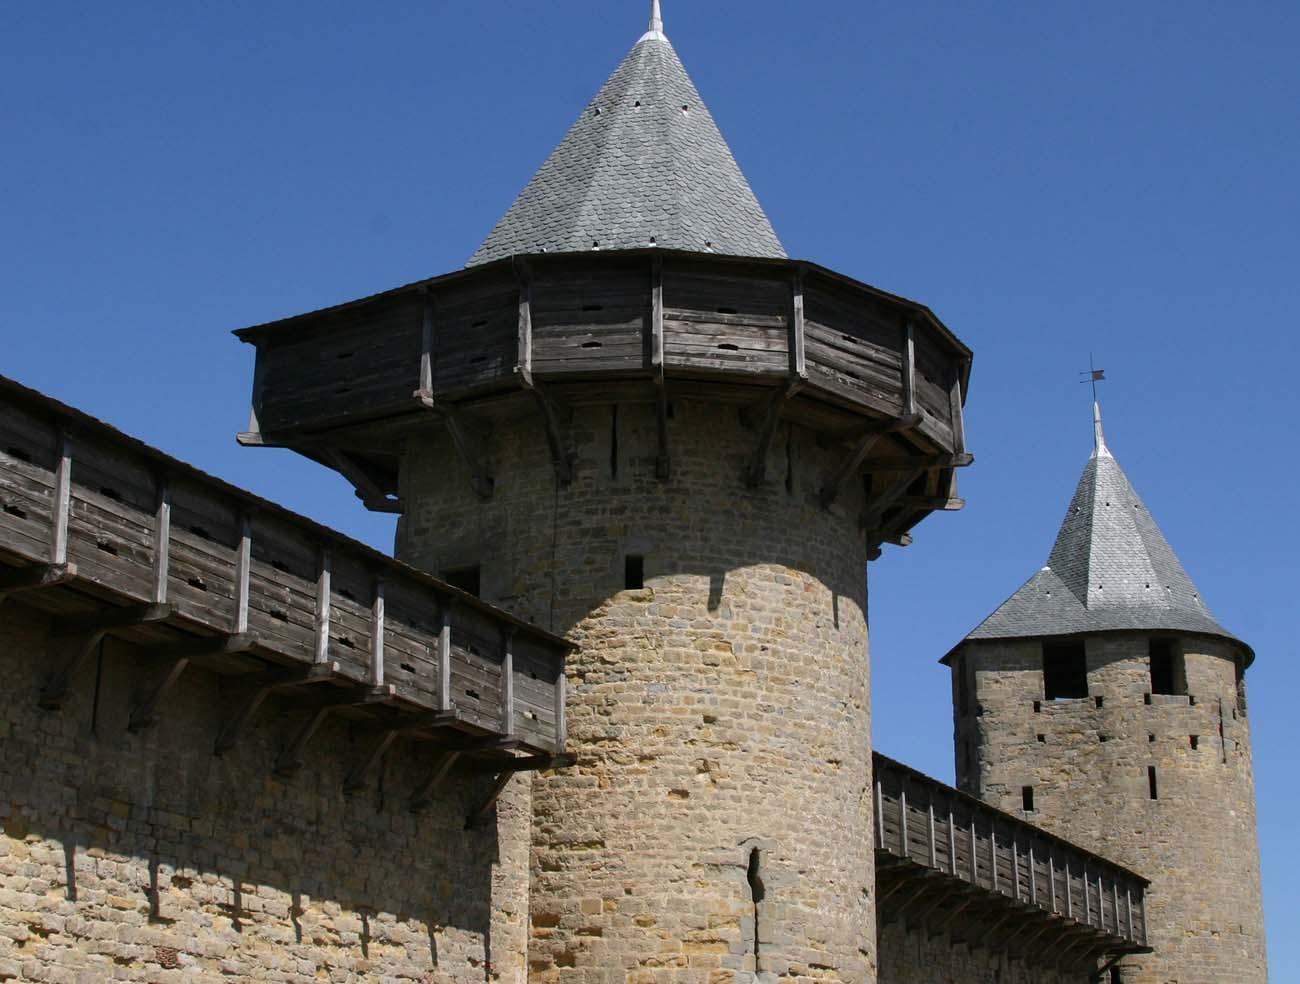 hurdycja-Carcassonne.jpg